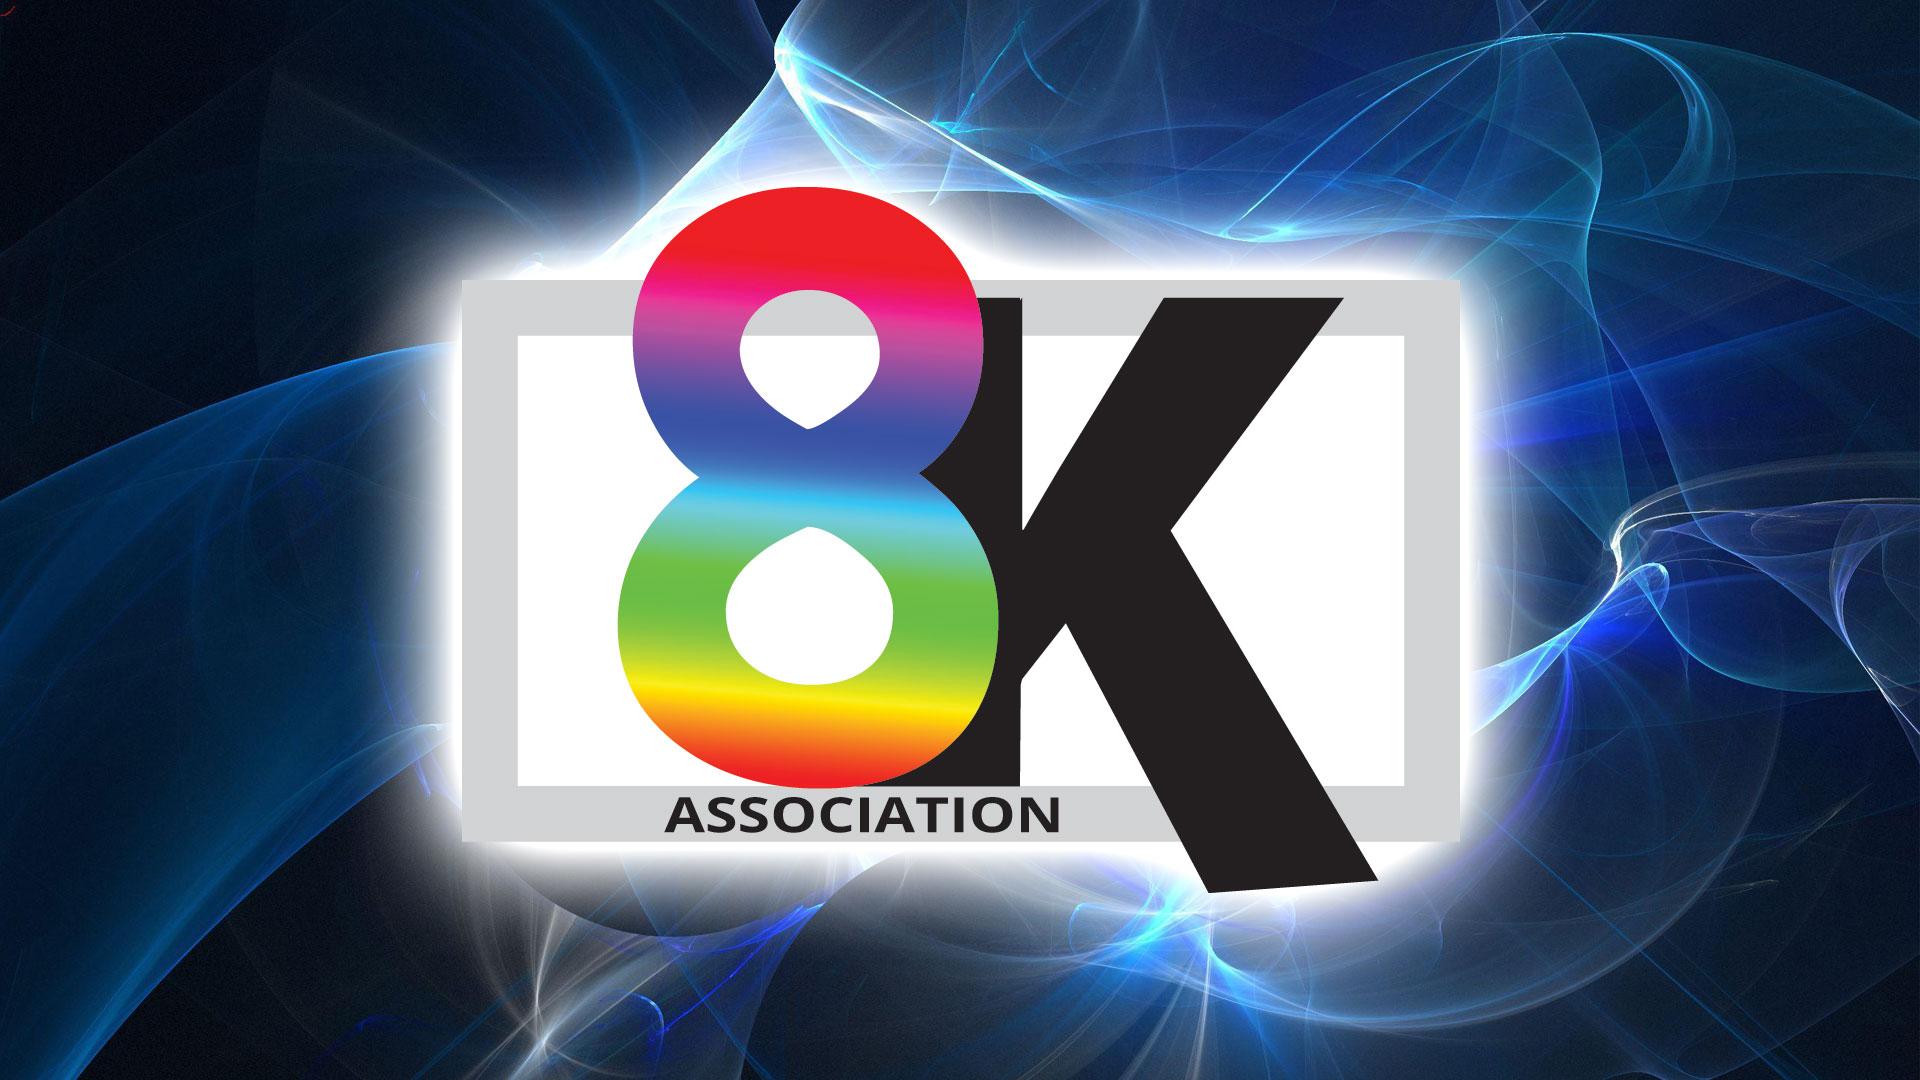 8K Association